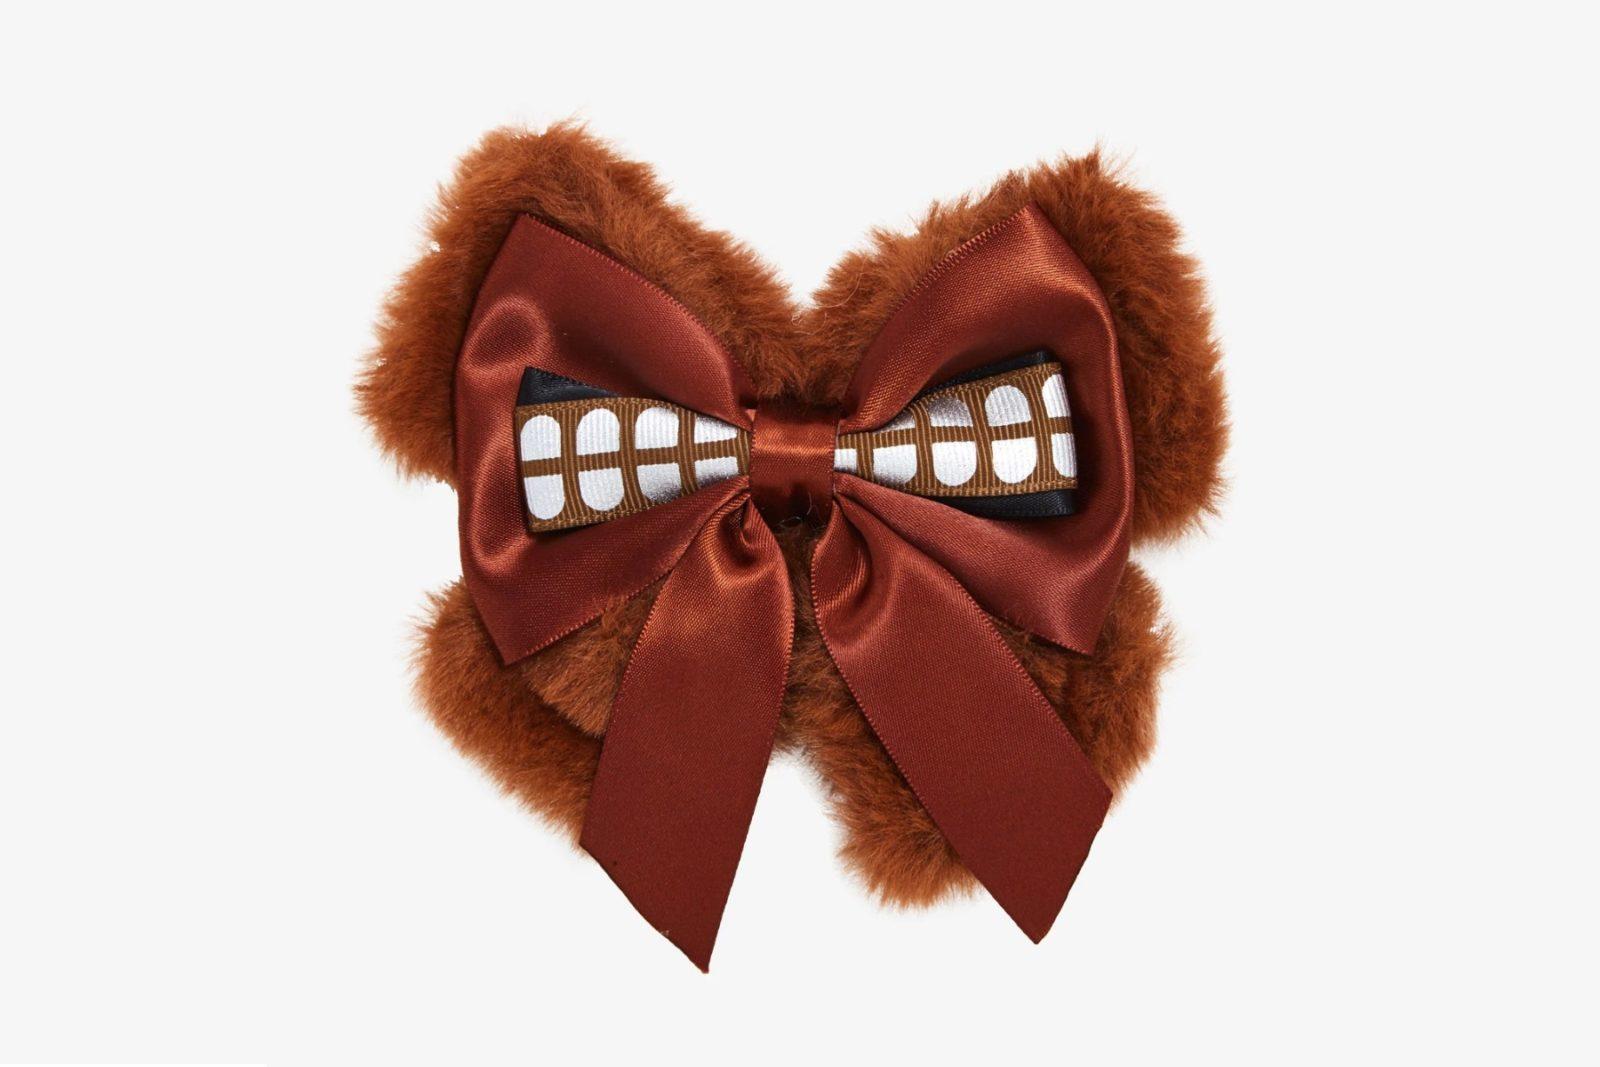 Star Wars Chewbacca Fuzzy Cosplay Hair Bow